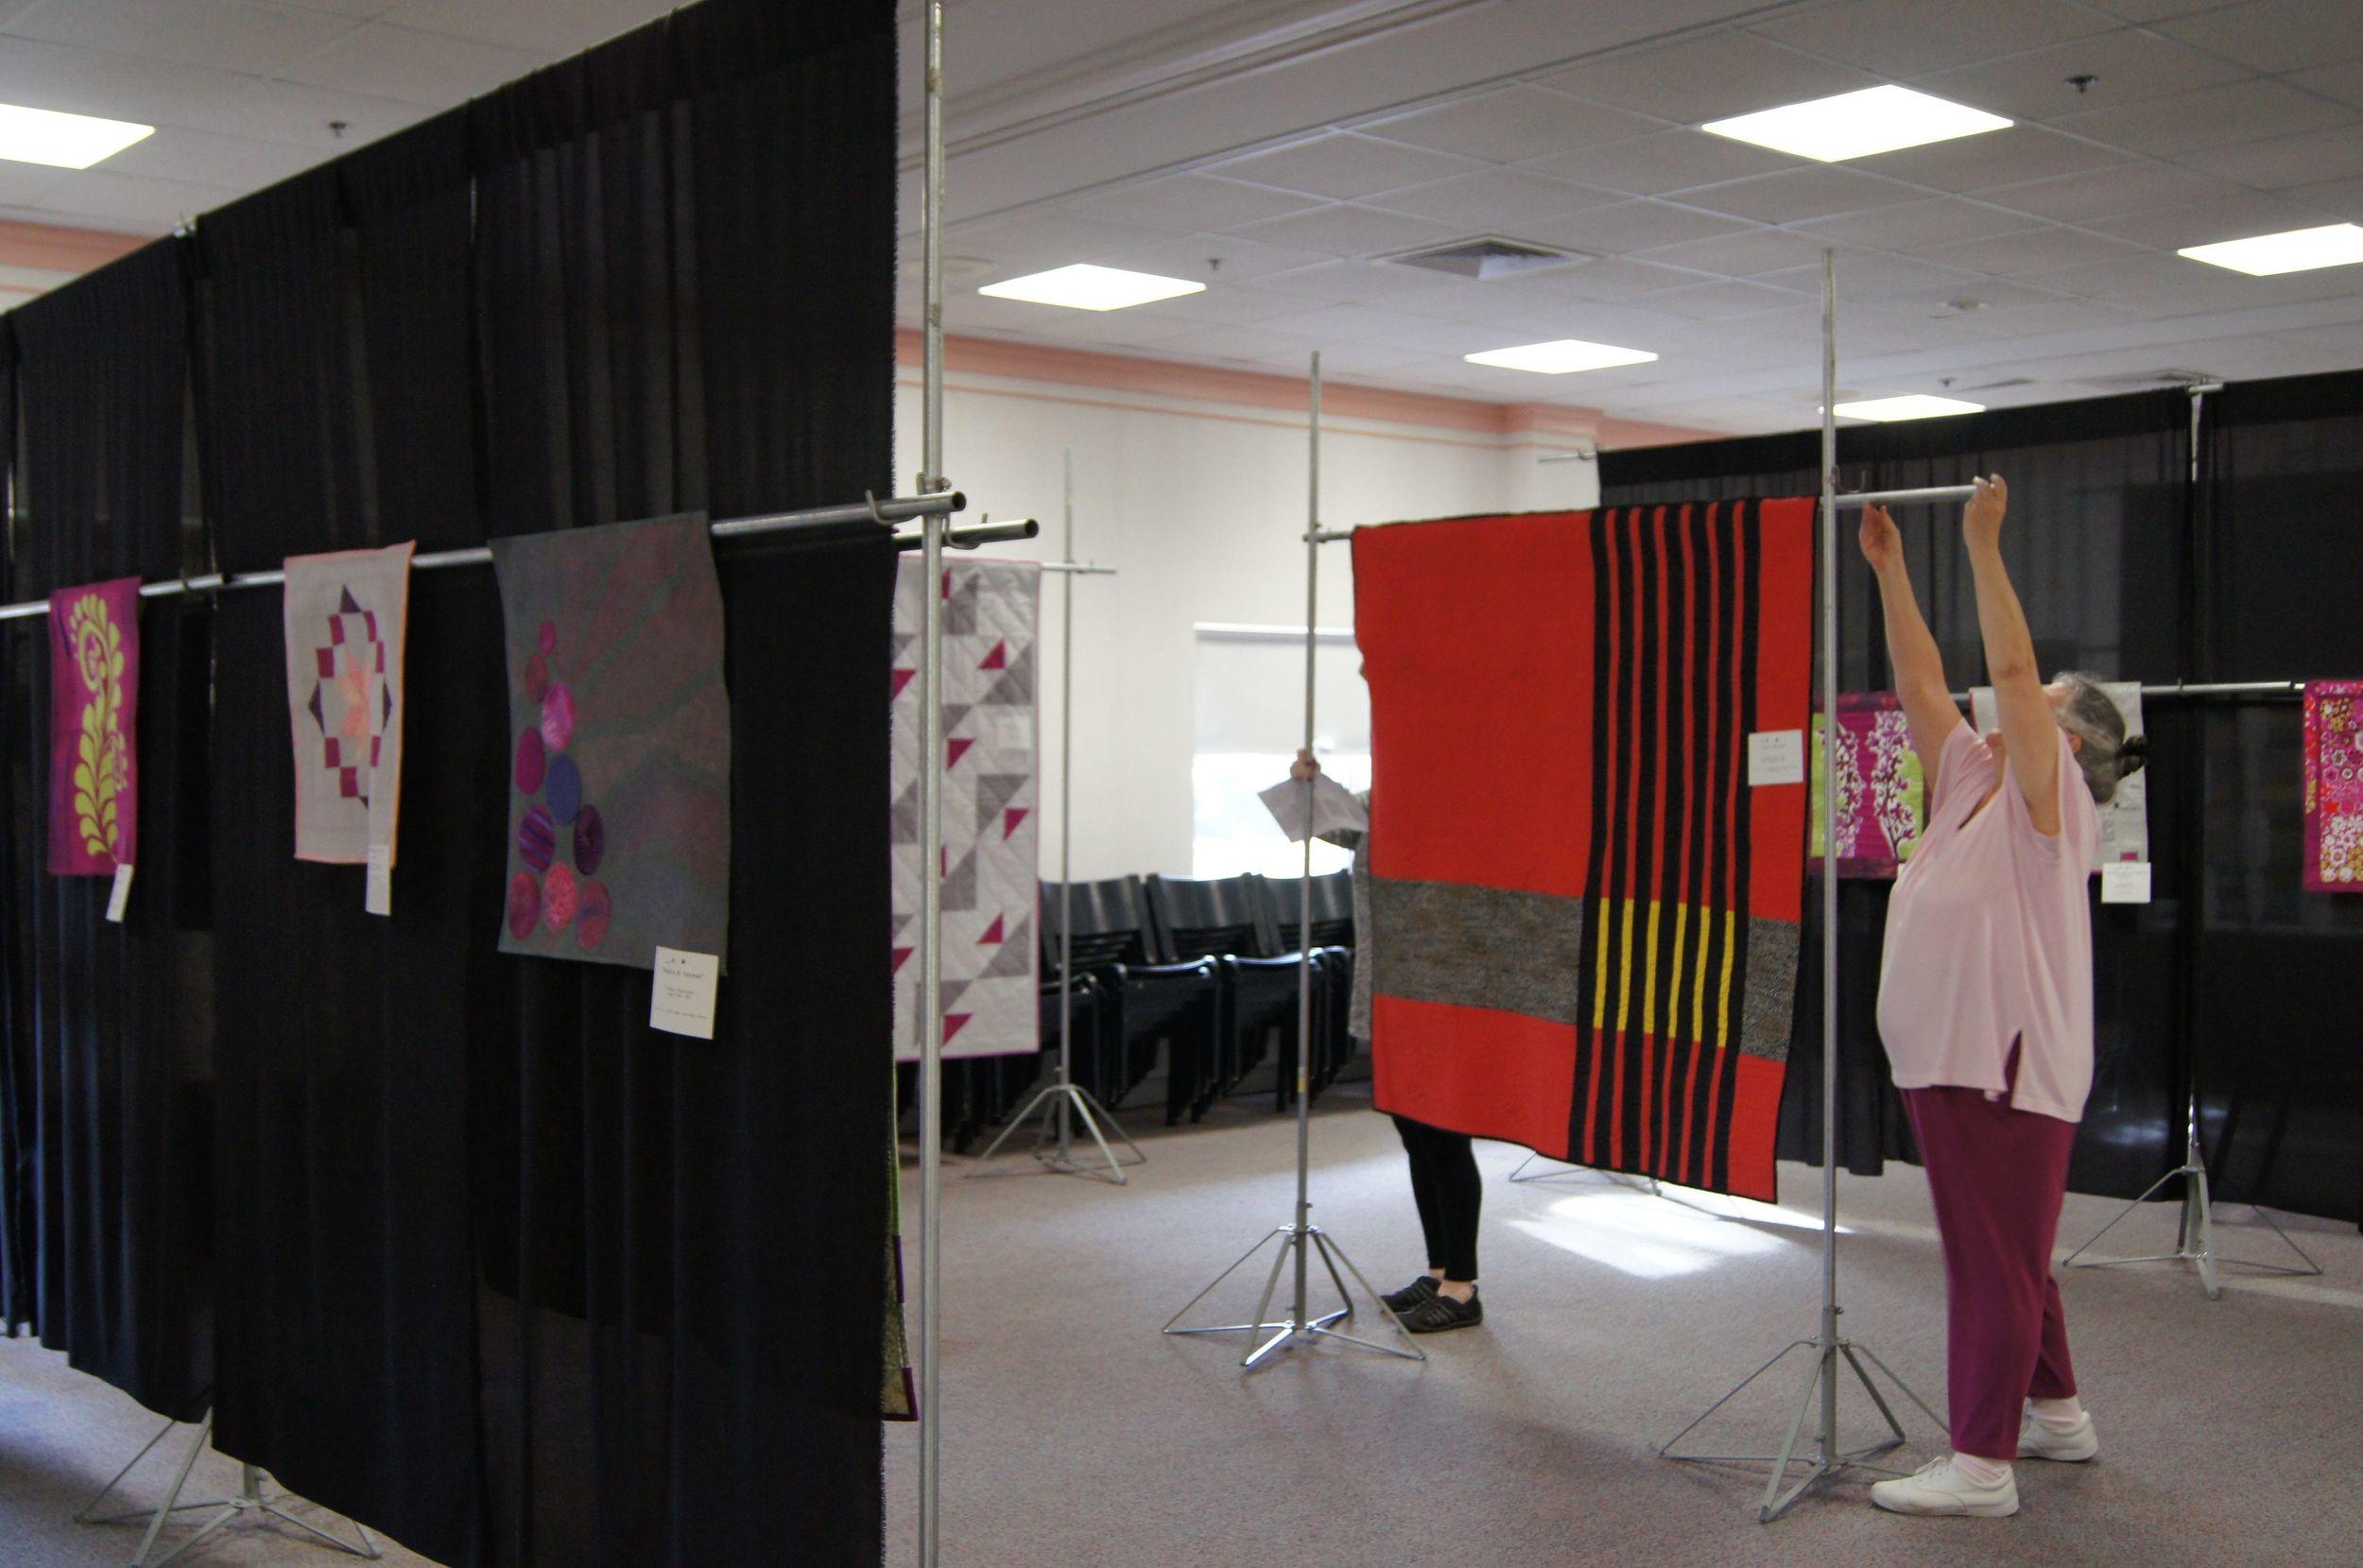 Hanging a quilt show 7.jpg